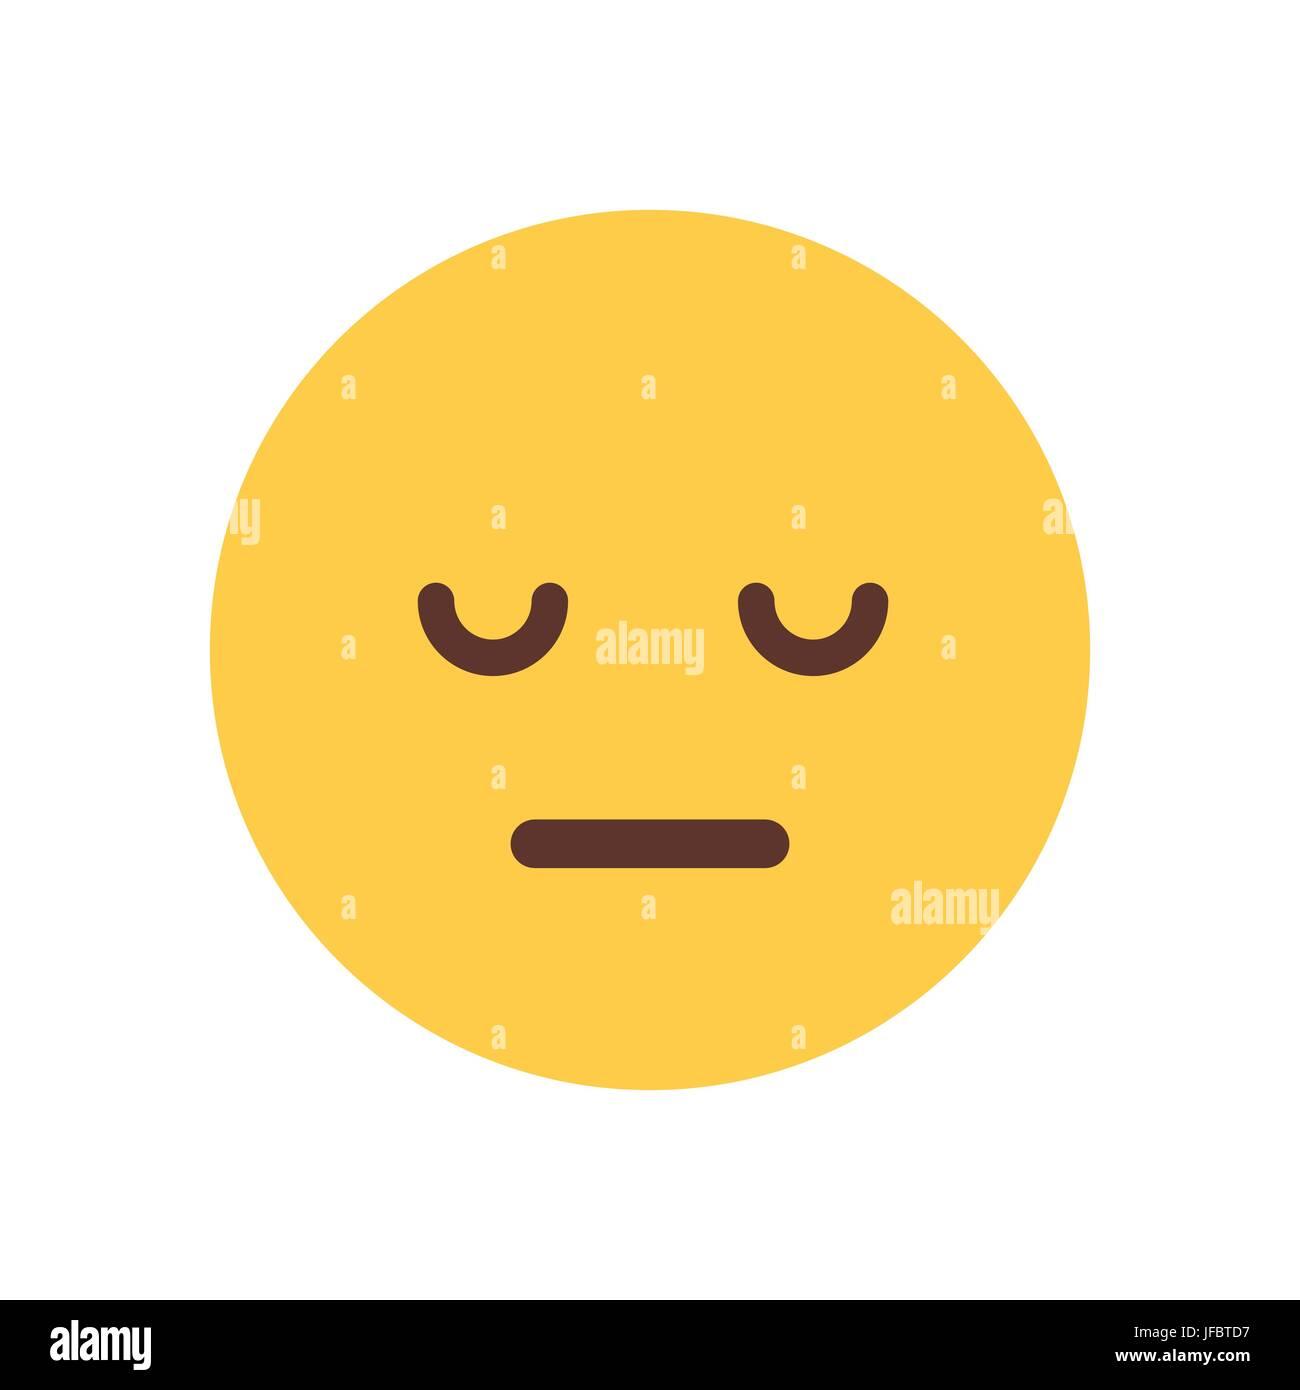 Yellow Cartoon Face Sad Upset Emoji People Emotion Icon Stock Vector Art Amp Illustration Vector